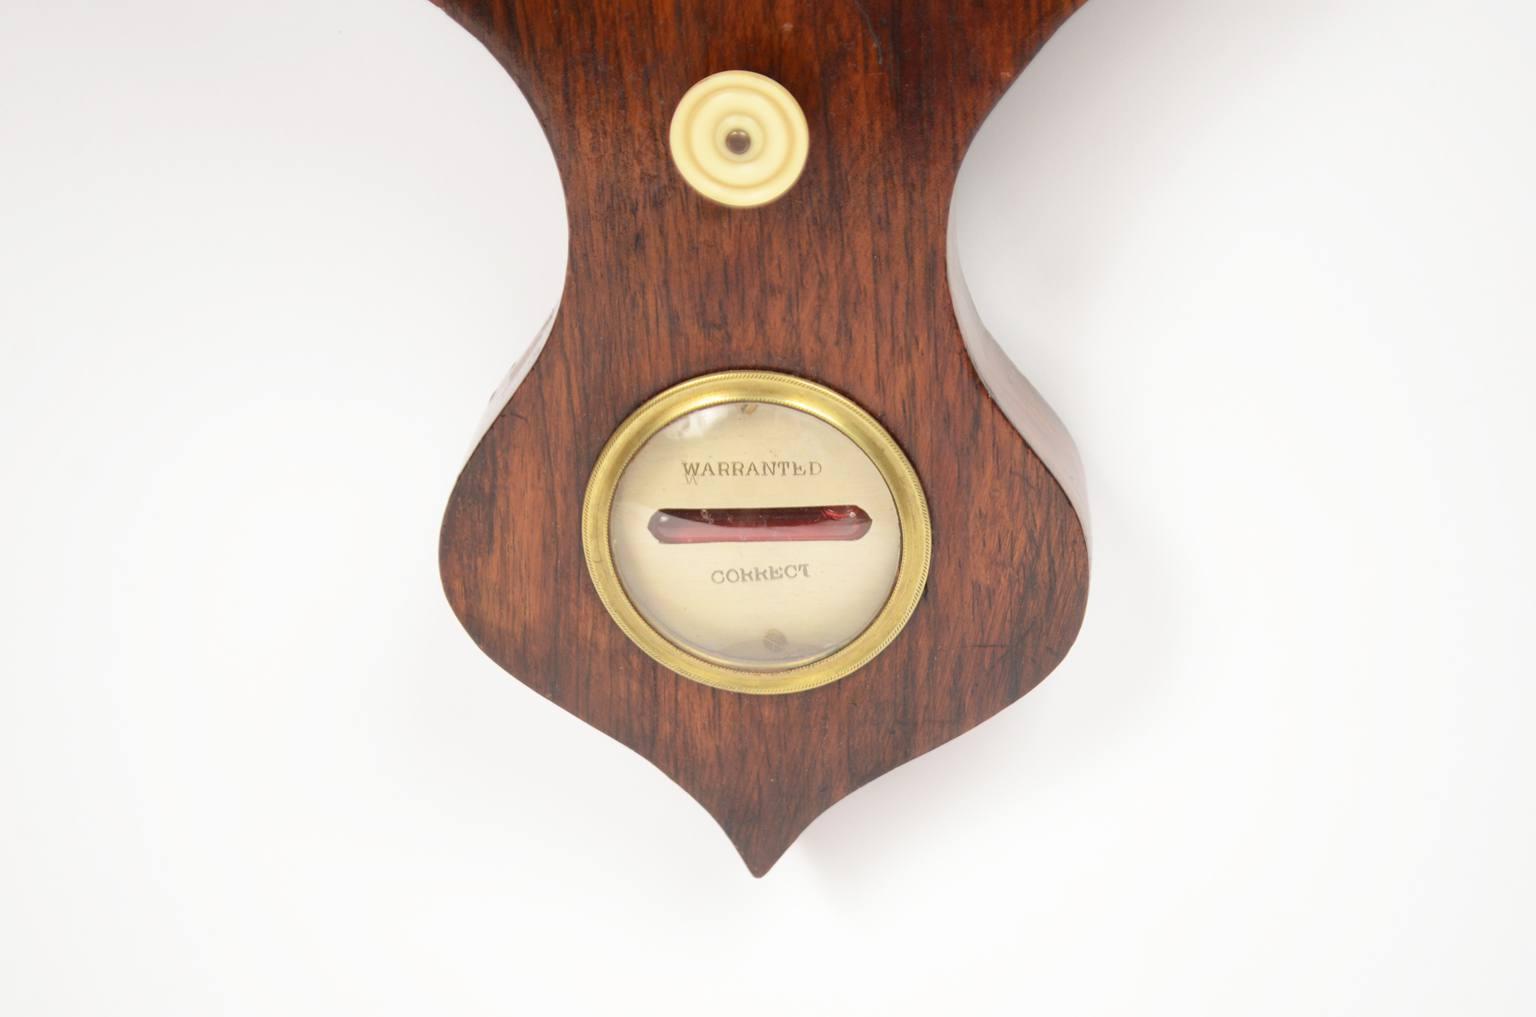 Barometri antichi/505A-Barometro epoca